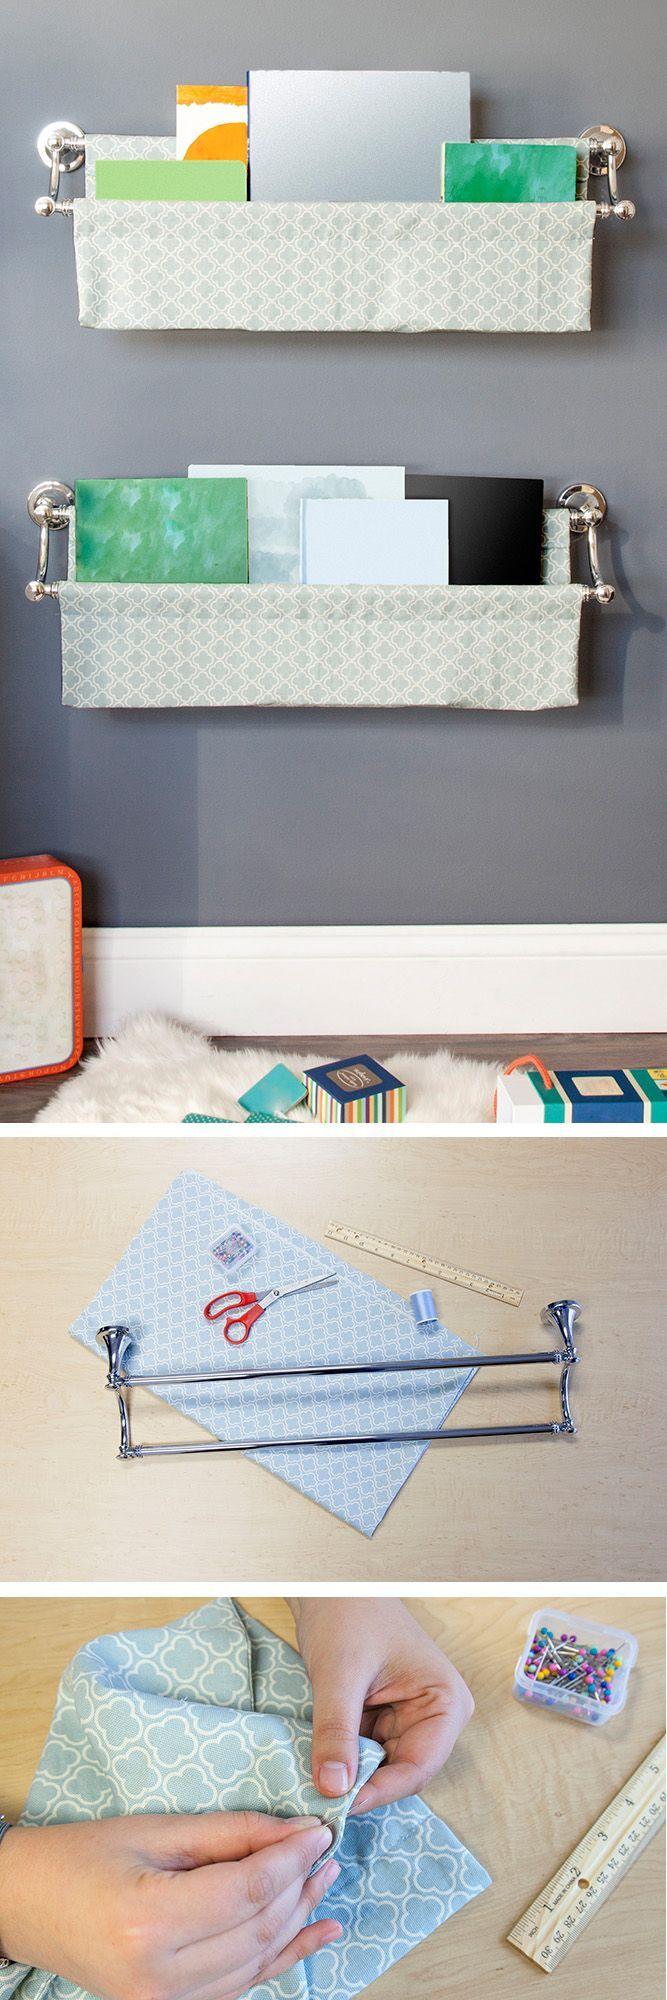 Best 25 book sling ideas on pinterest fabric bookshelf how to diy wall mounted book sling solutioingenieria Choice Image